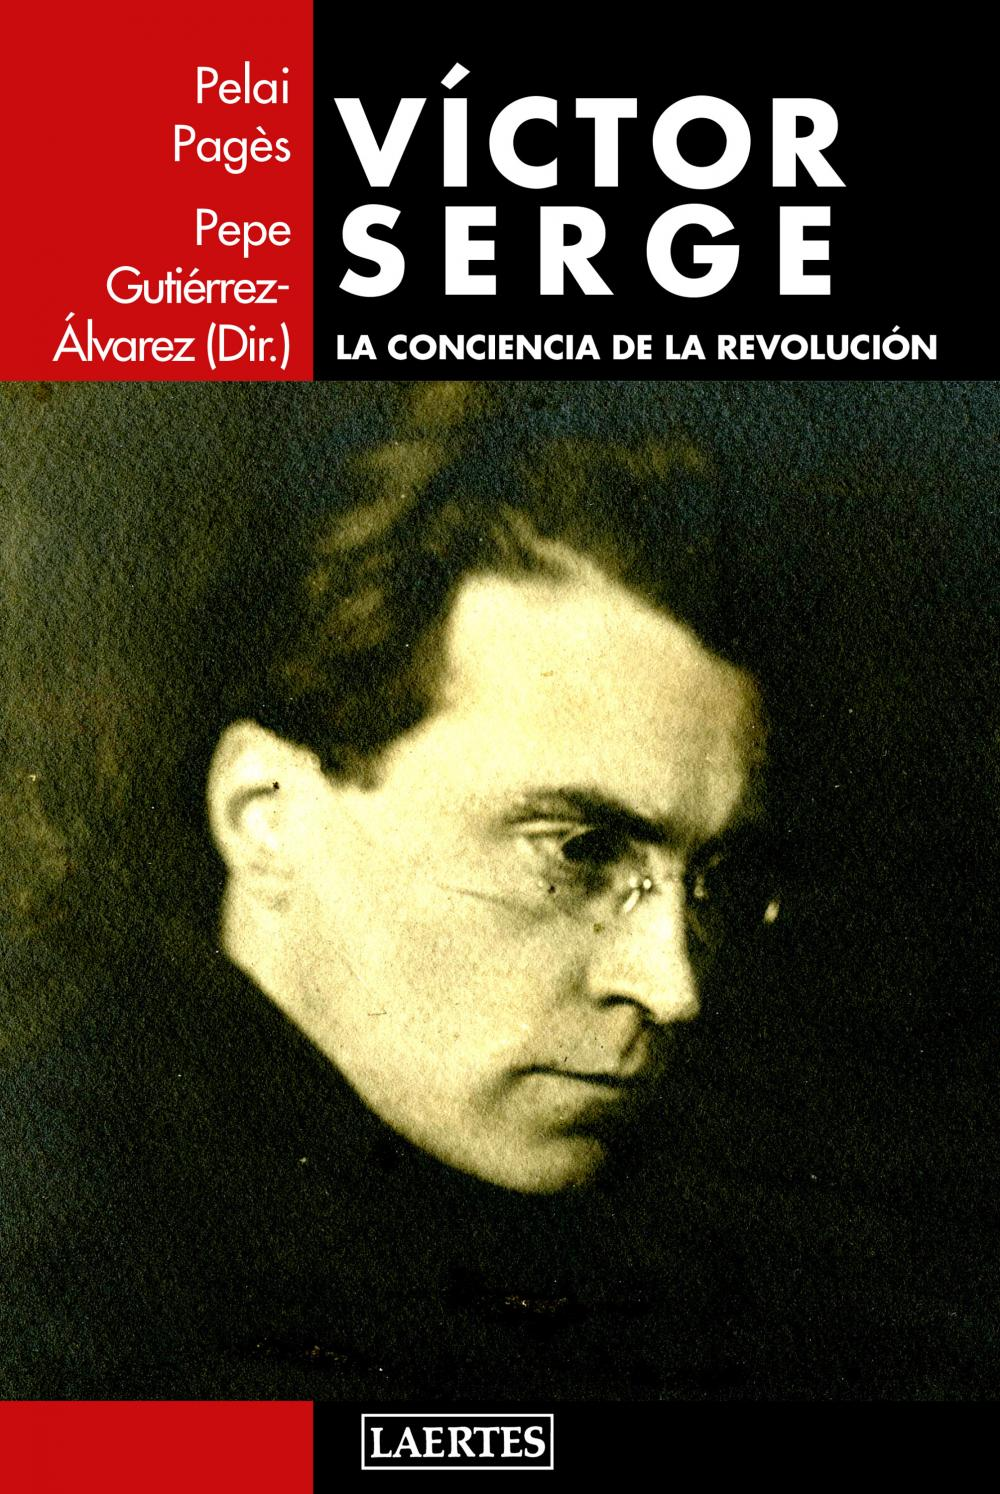 Víctor Serge